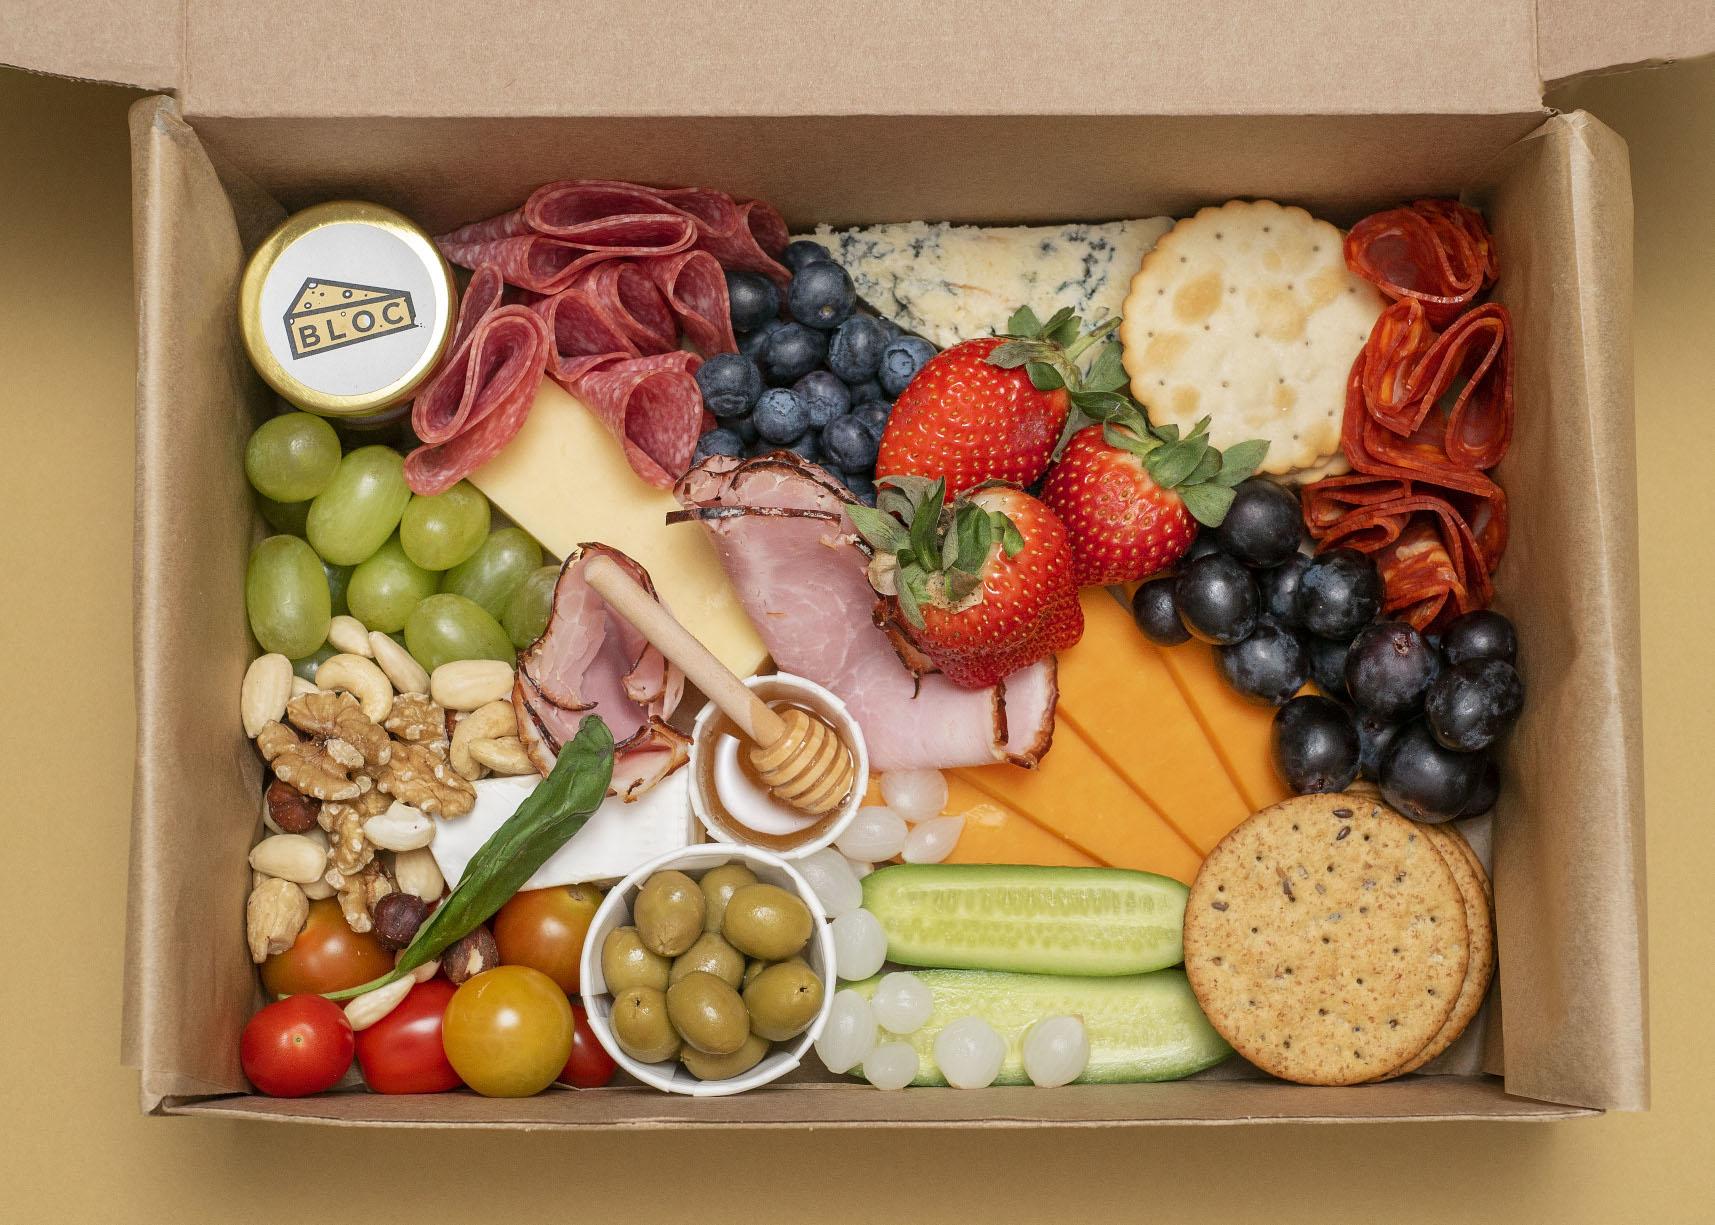 Bloc Folkestone Cheese Box